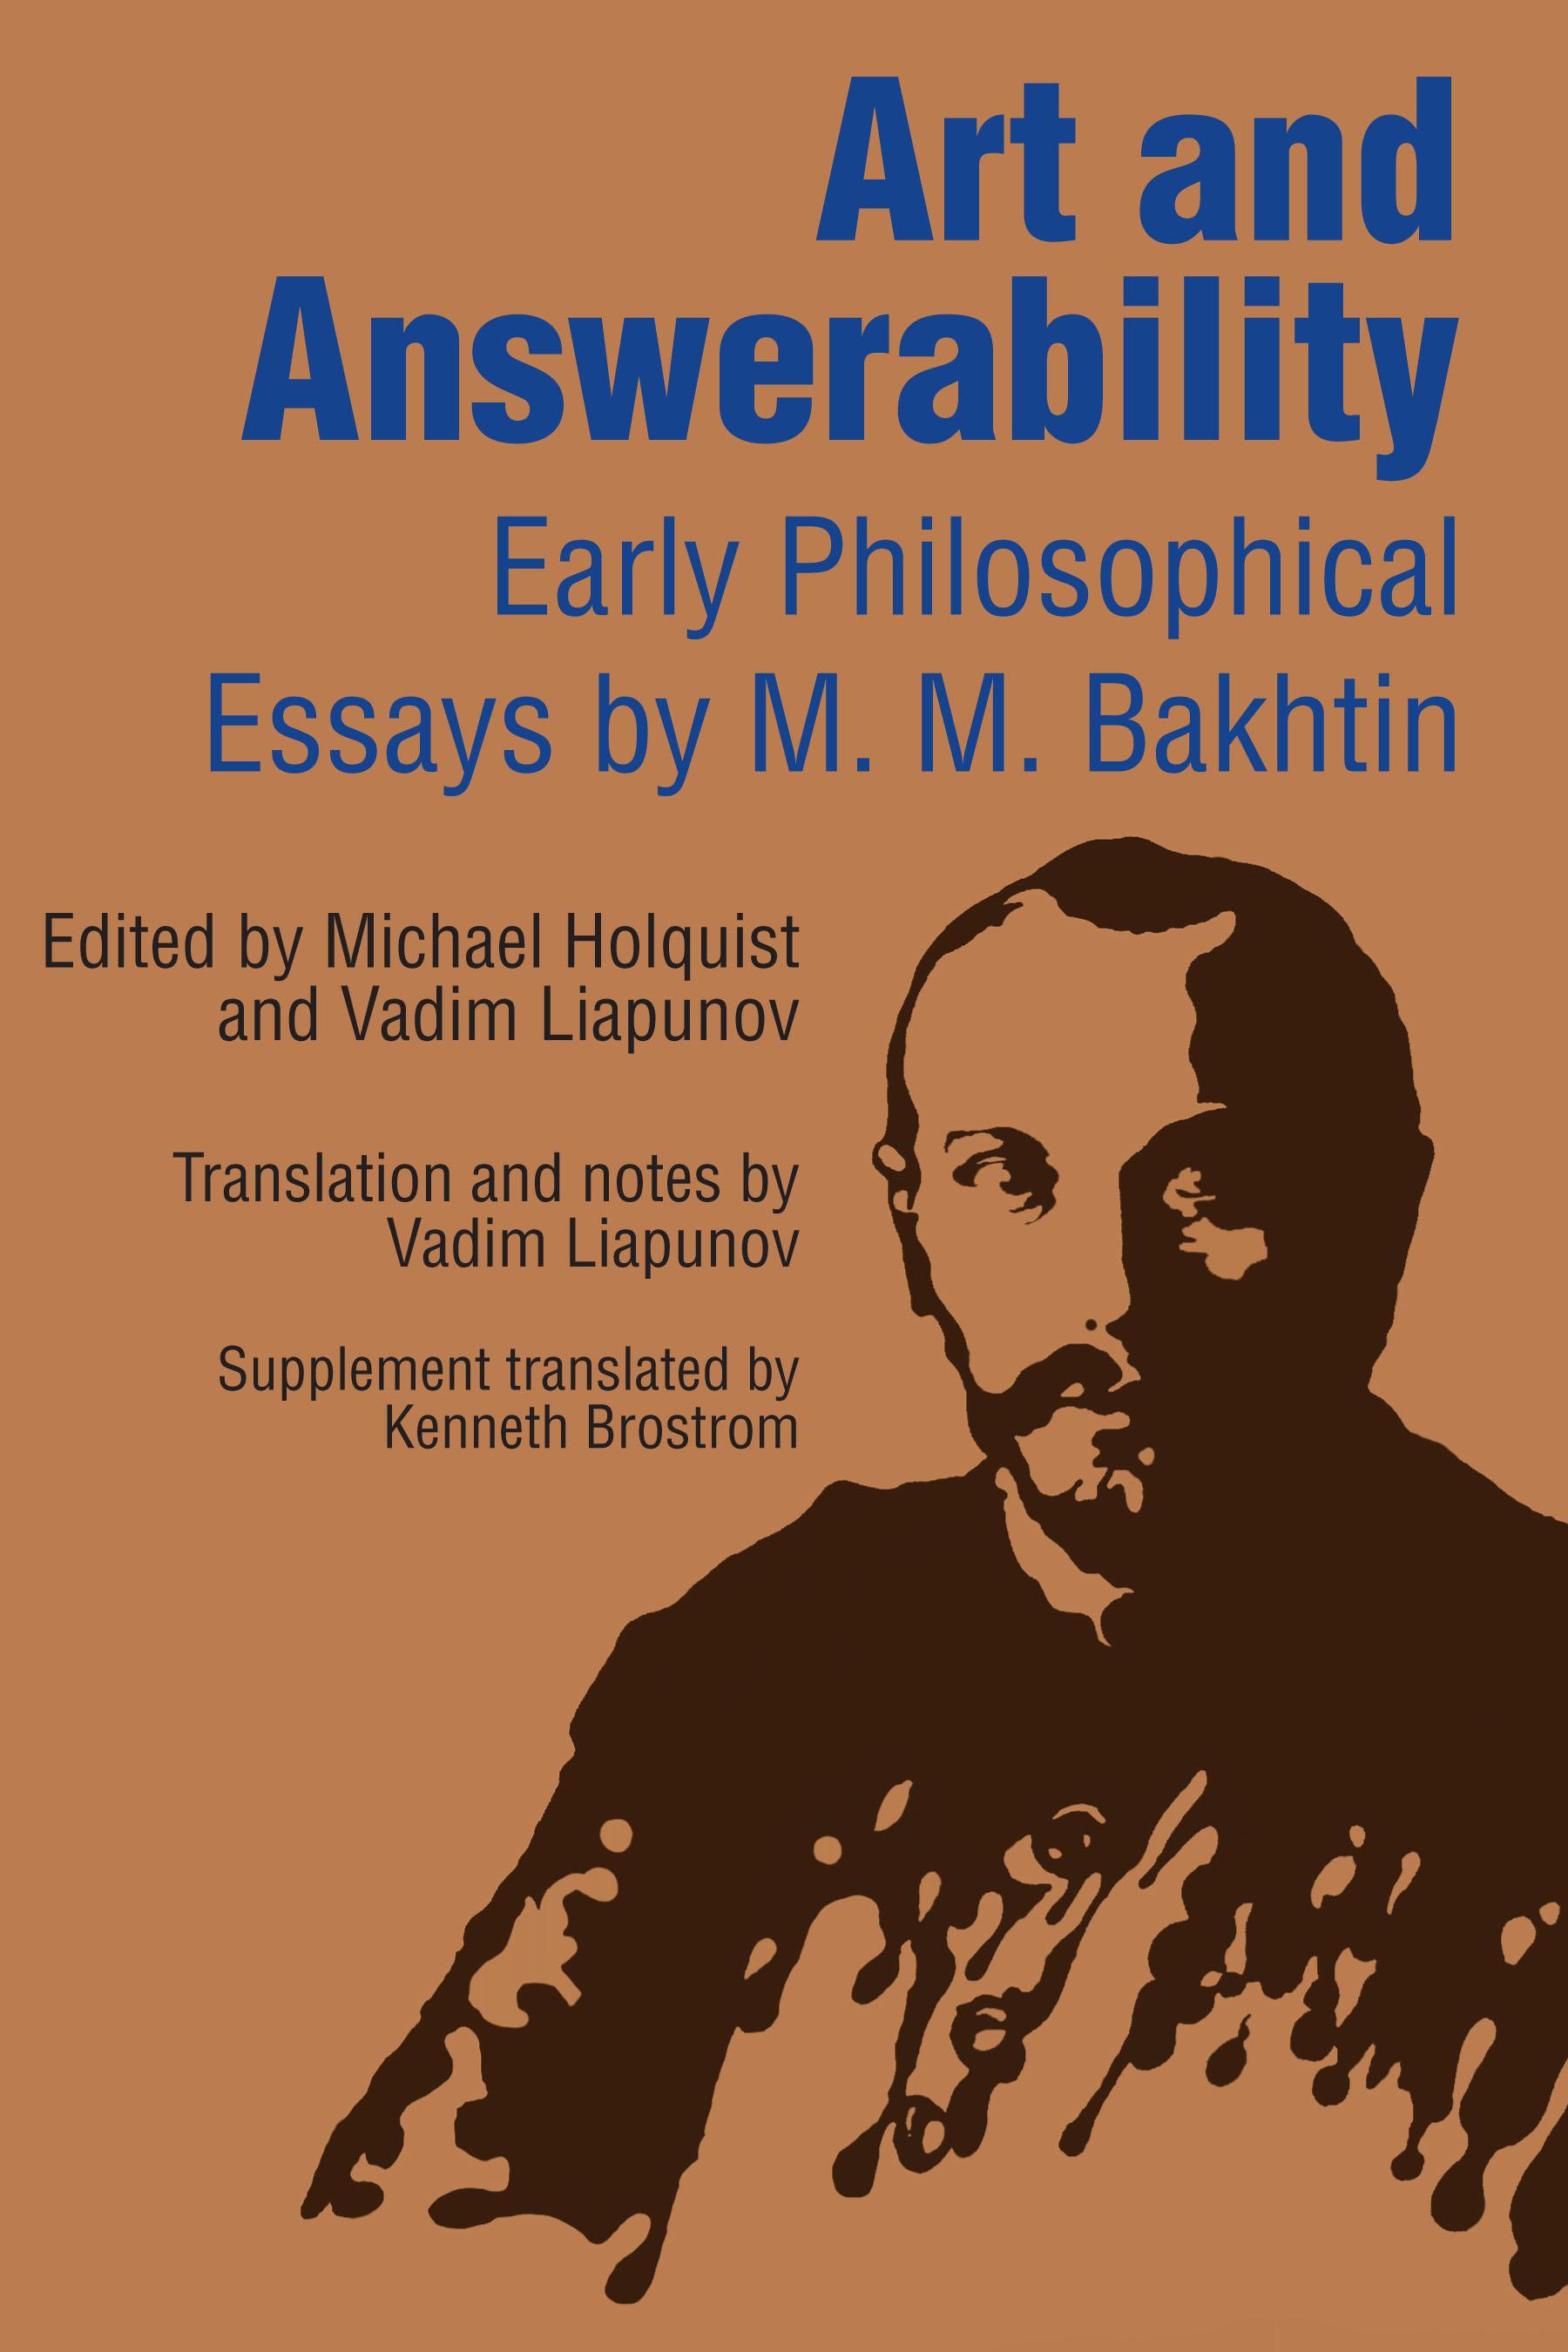 mikhail bakhtin theory